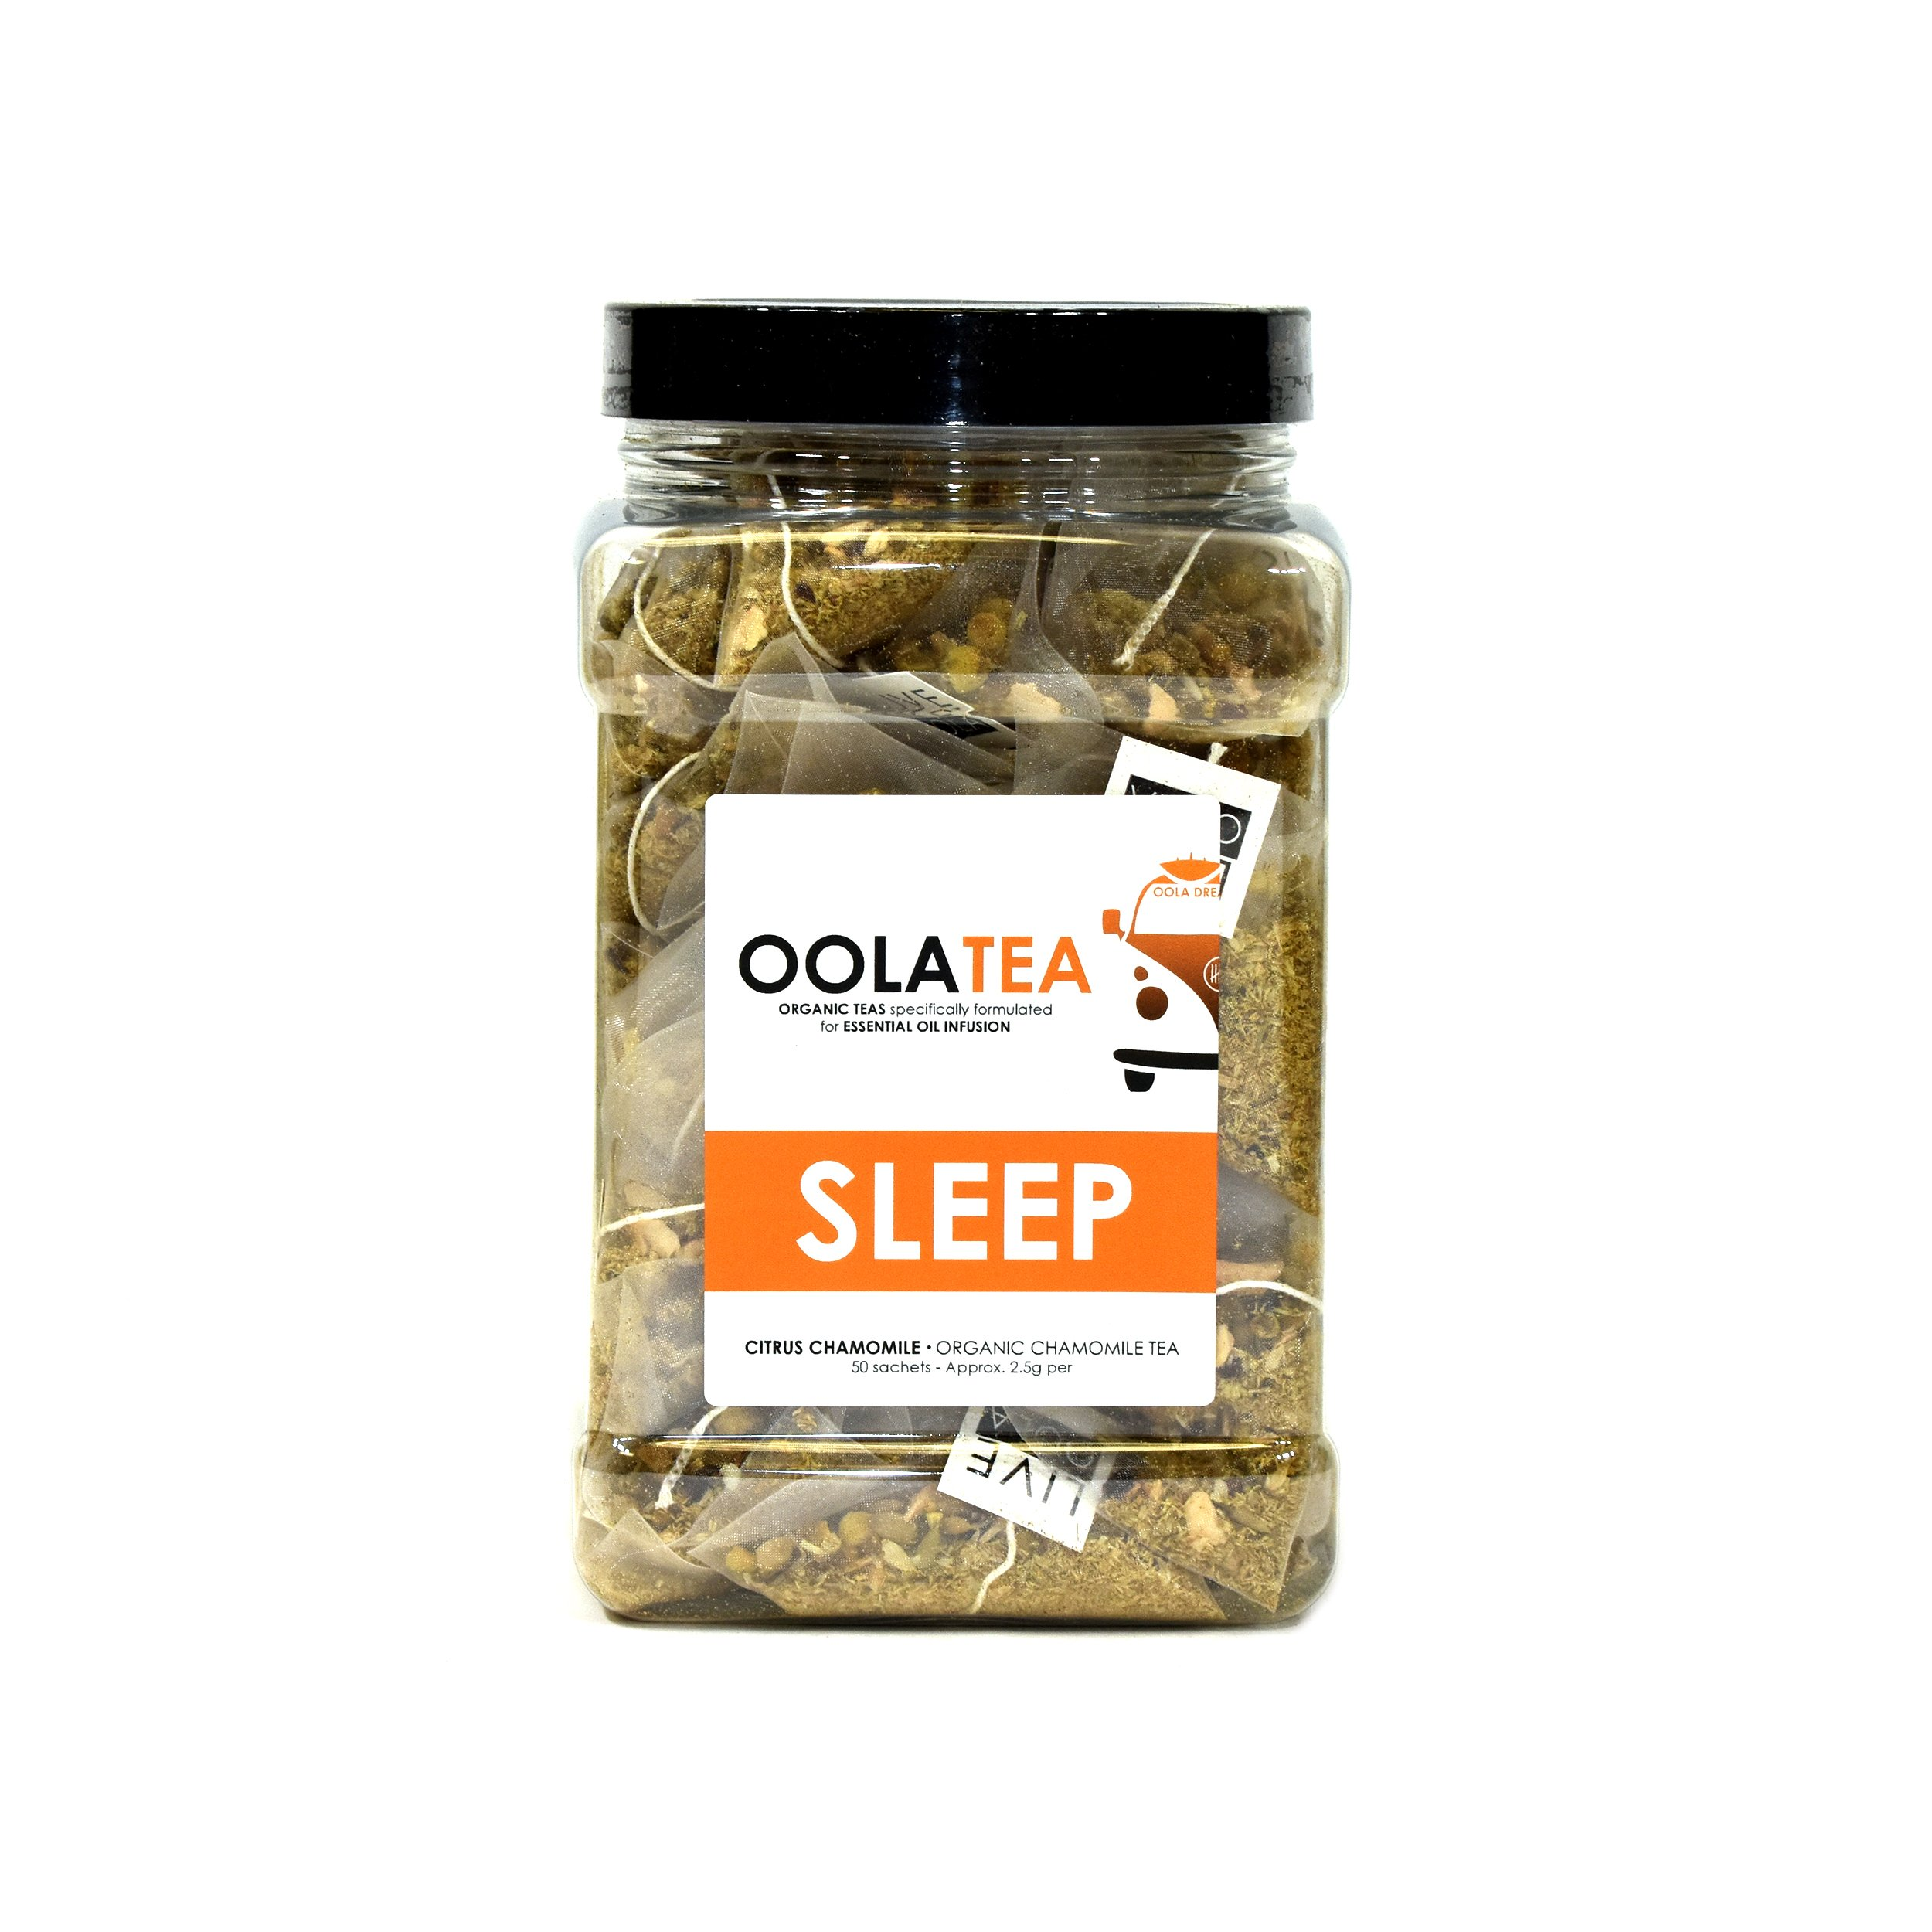 Oola Tea - SLEEP 50 Count | Certified Organic Citrus Chamomile | Improves Sleep | Reduces Stress